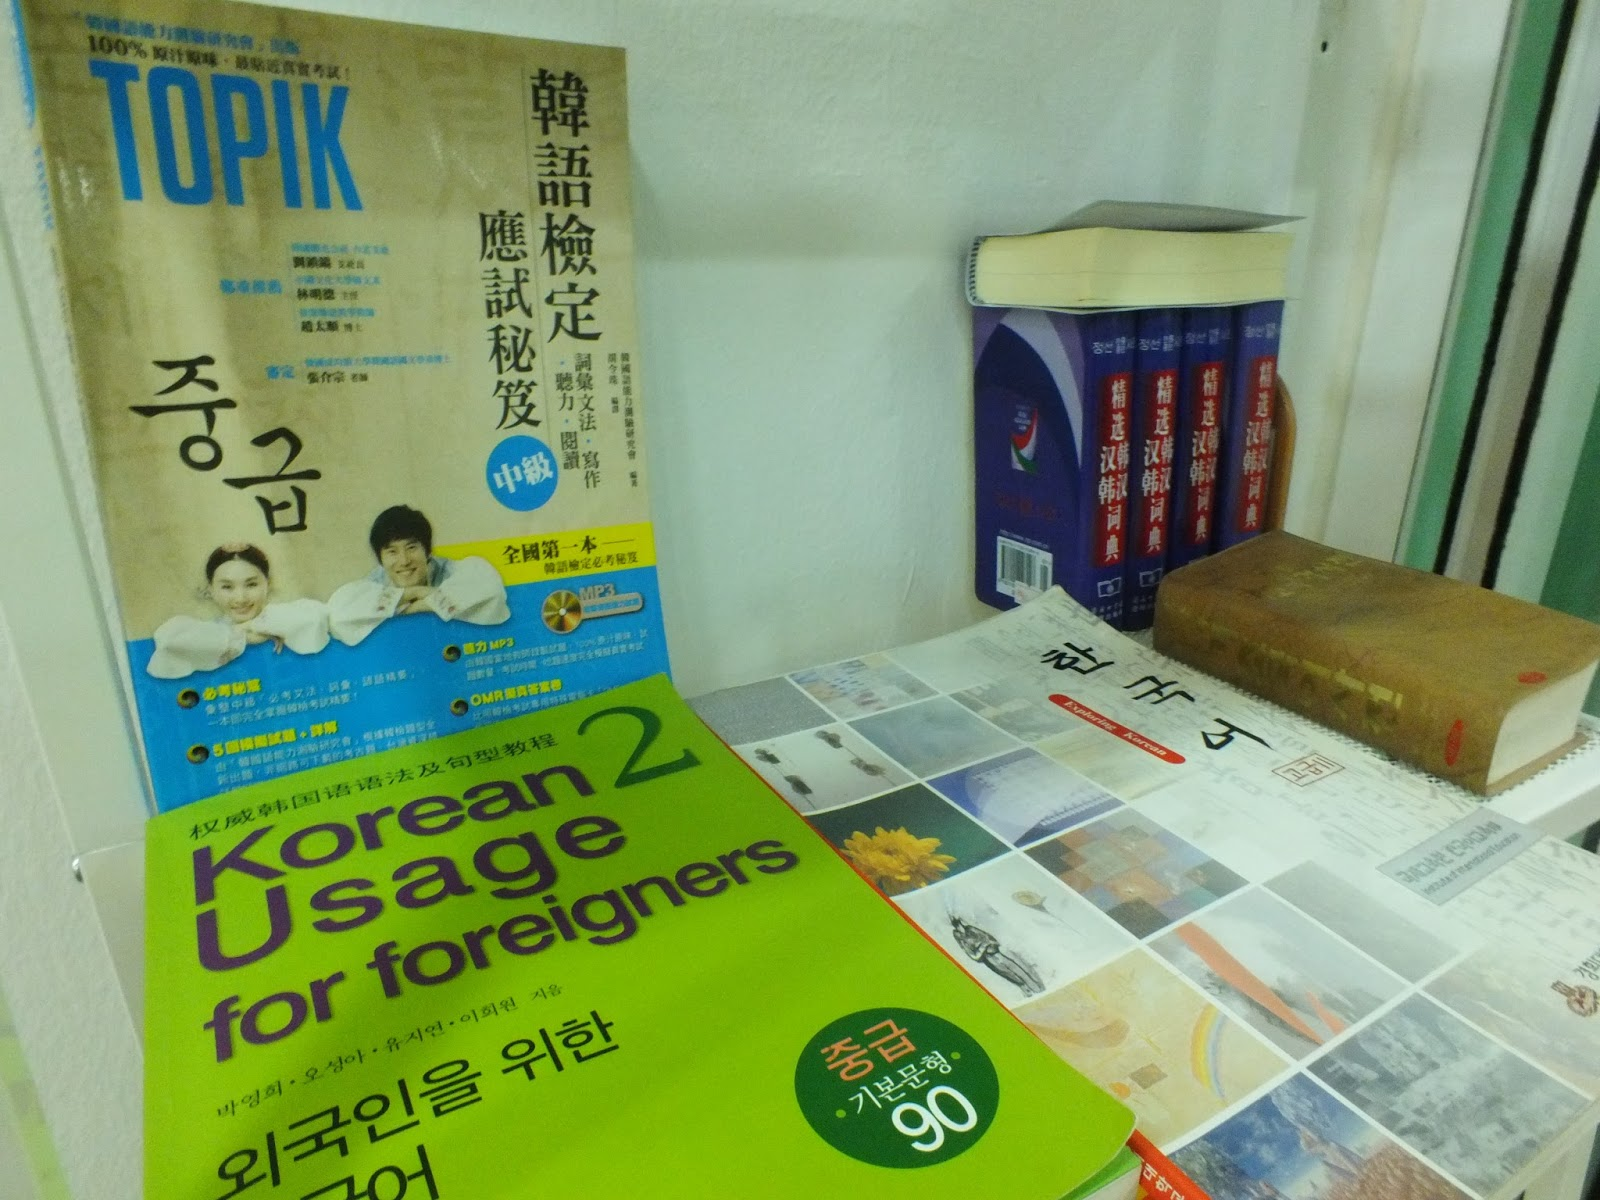 Korean bookstore opens in Malaysia | Korea Blog